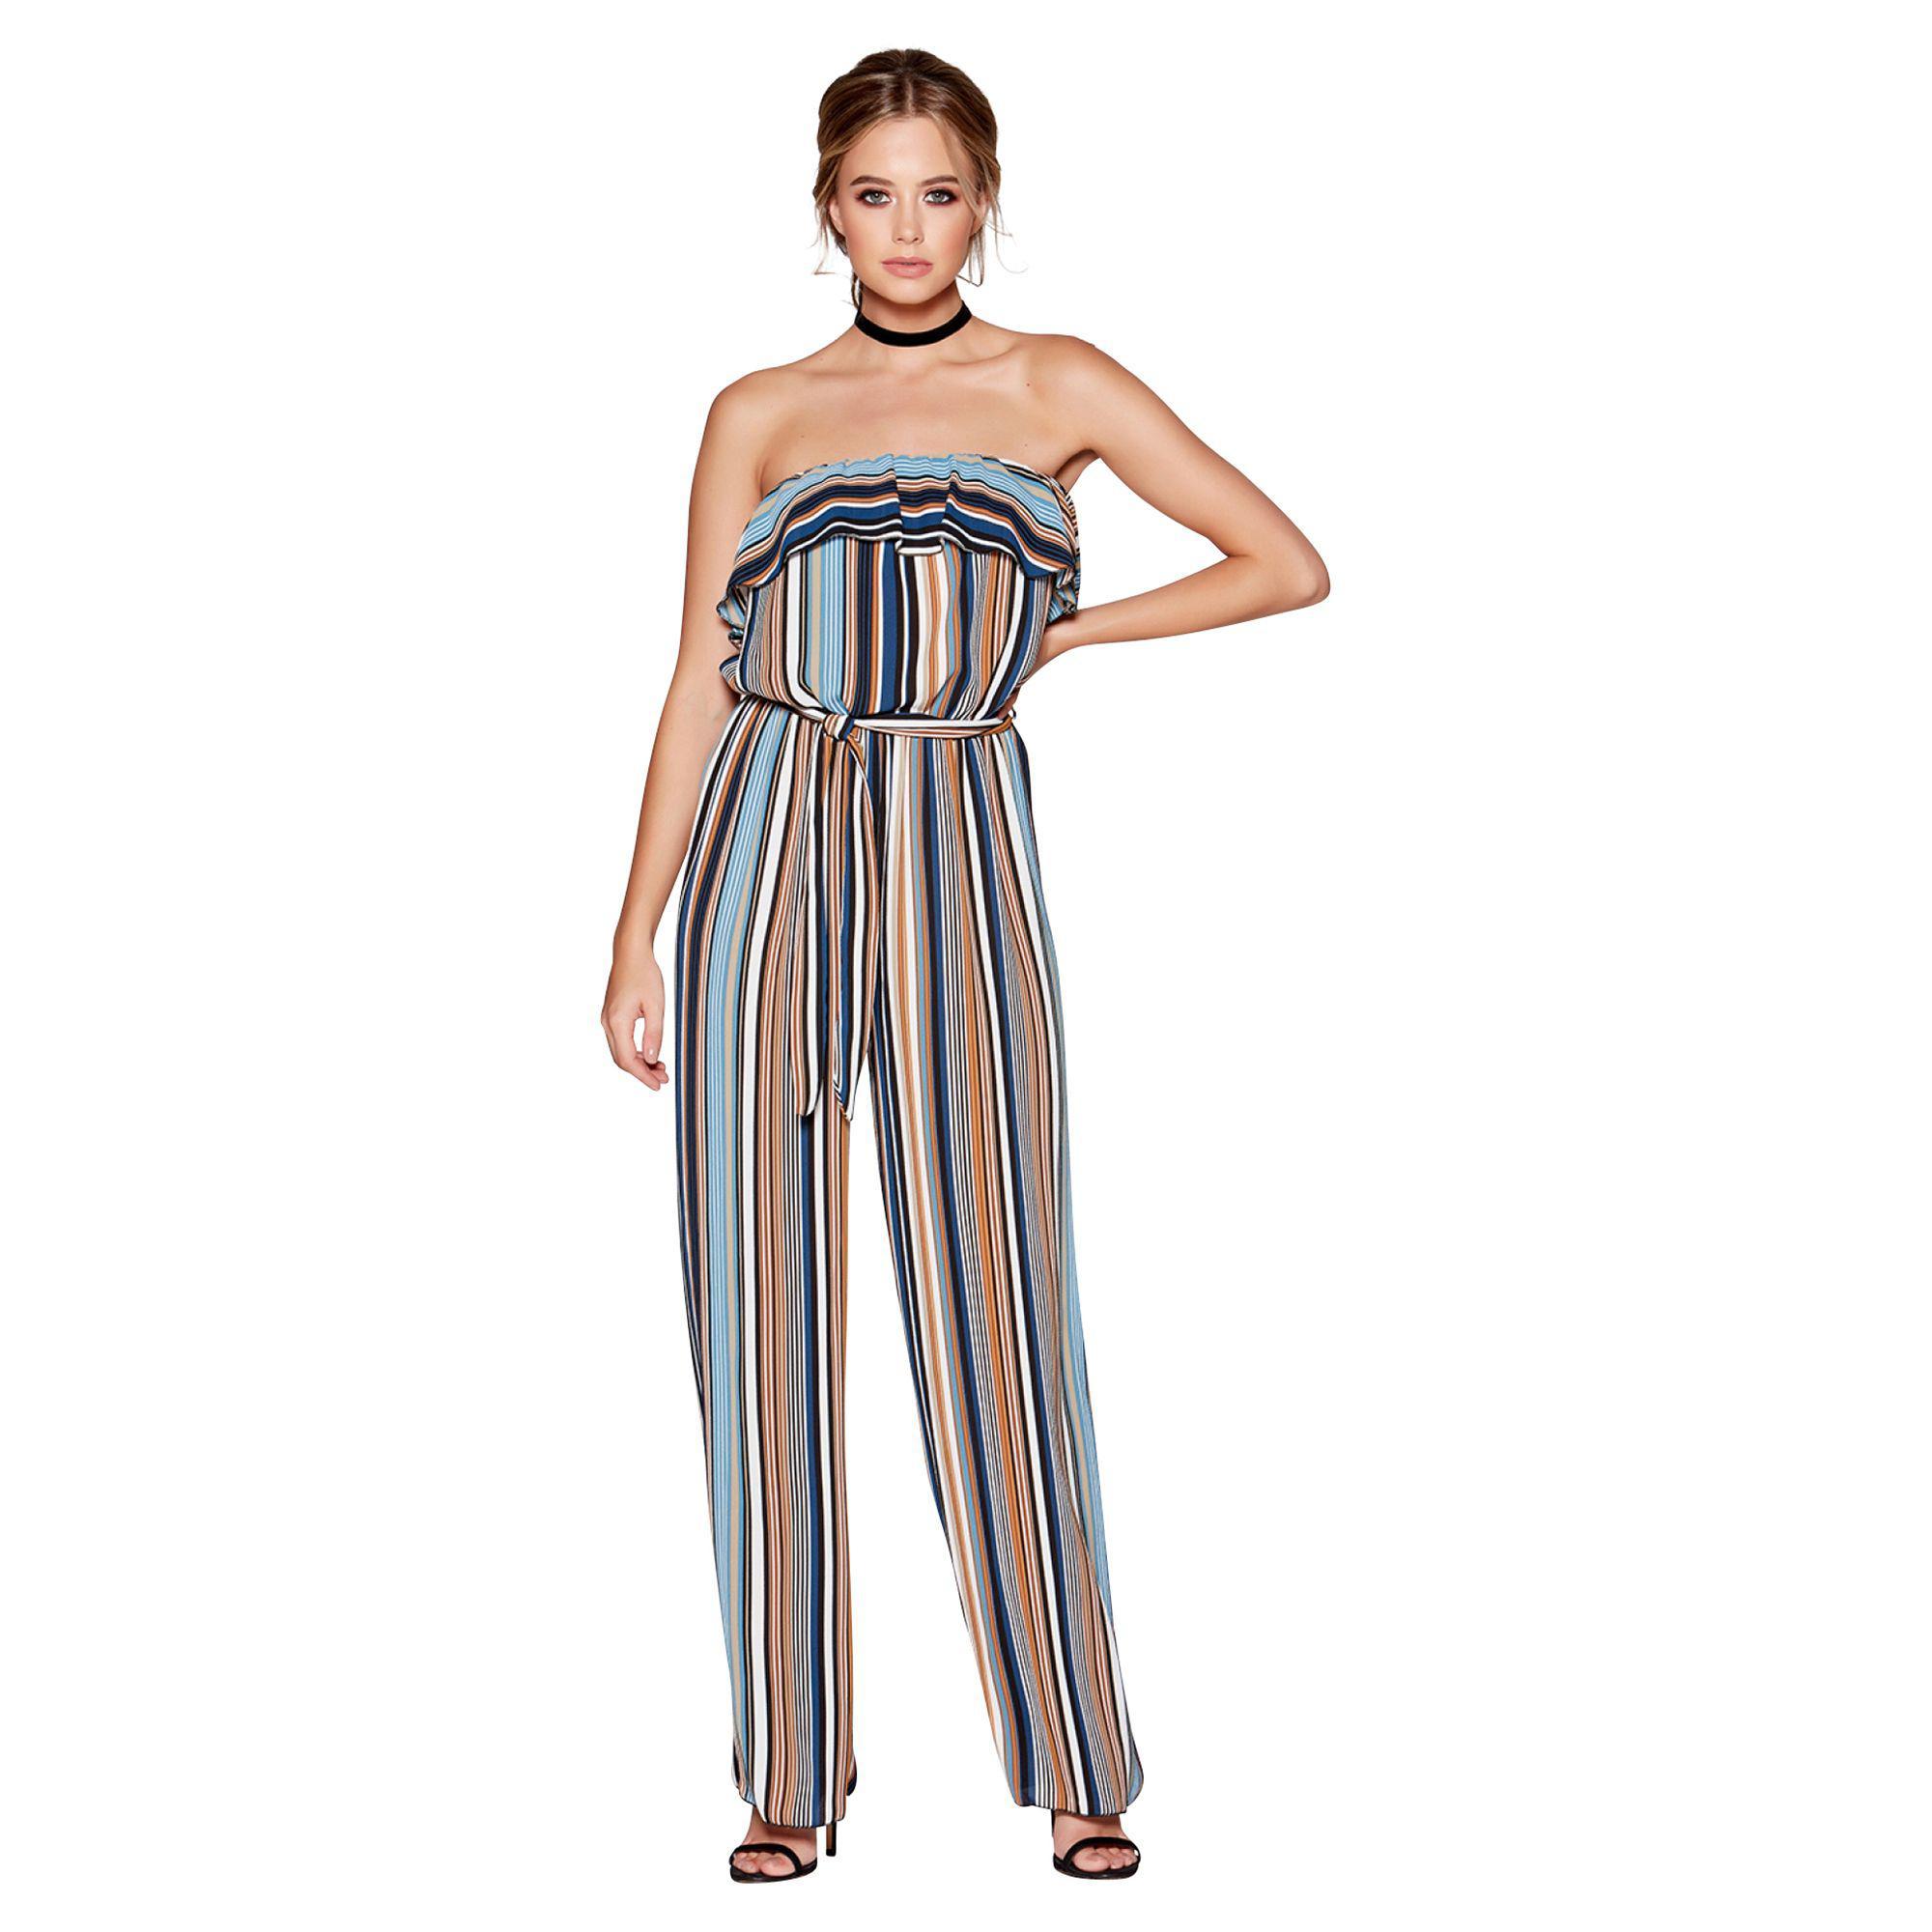 c8ac6bf18b Quiz Blue Tan And Cream Stripe Strapless Jumpsuit in Blue - Lyst